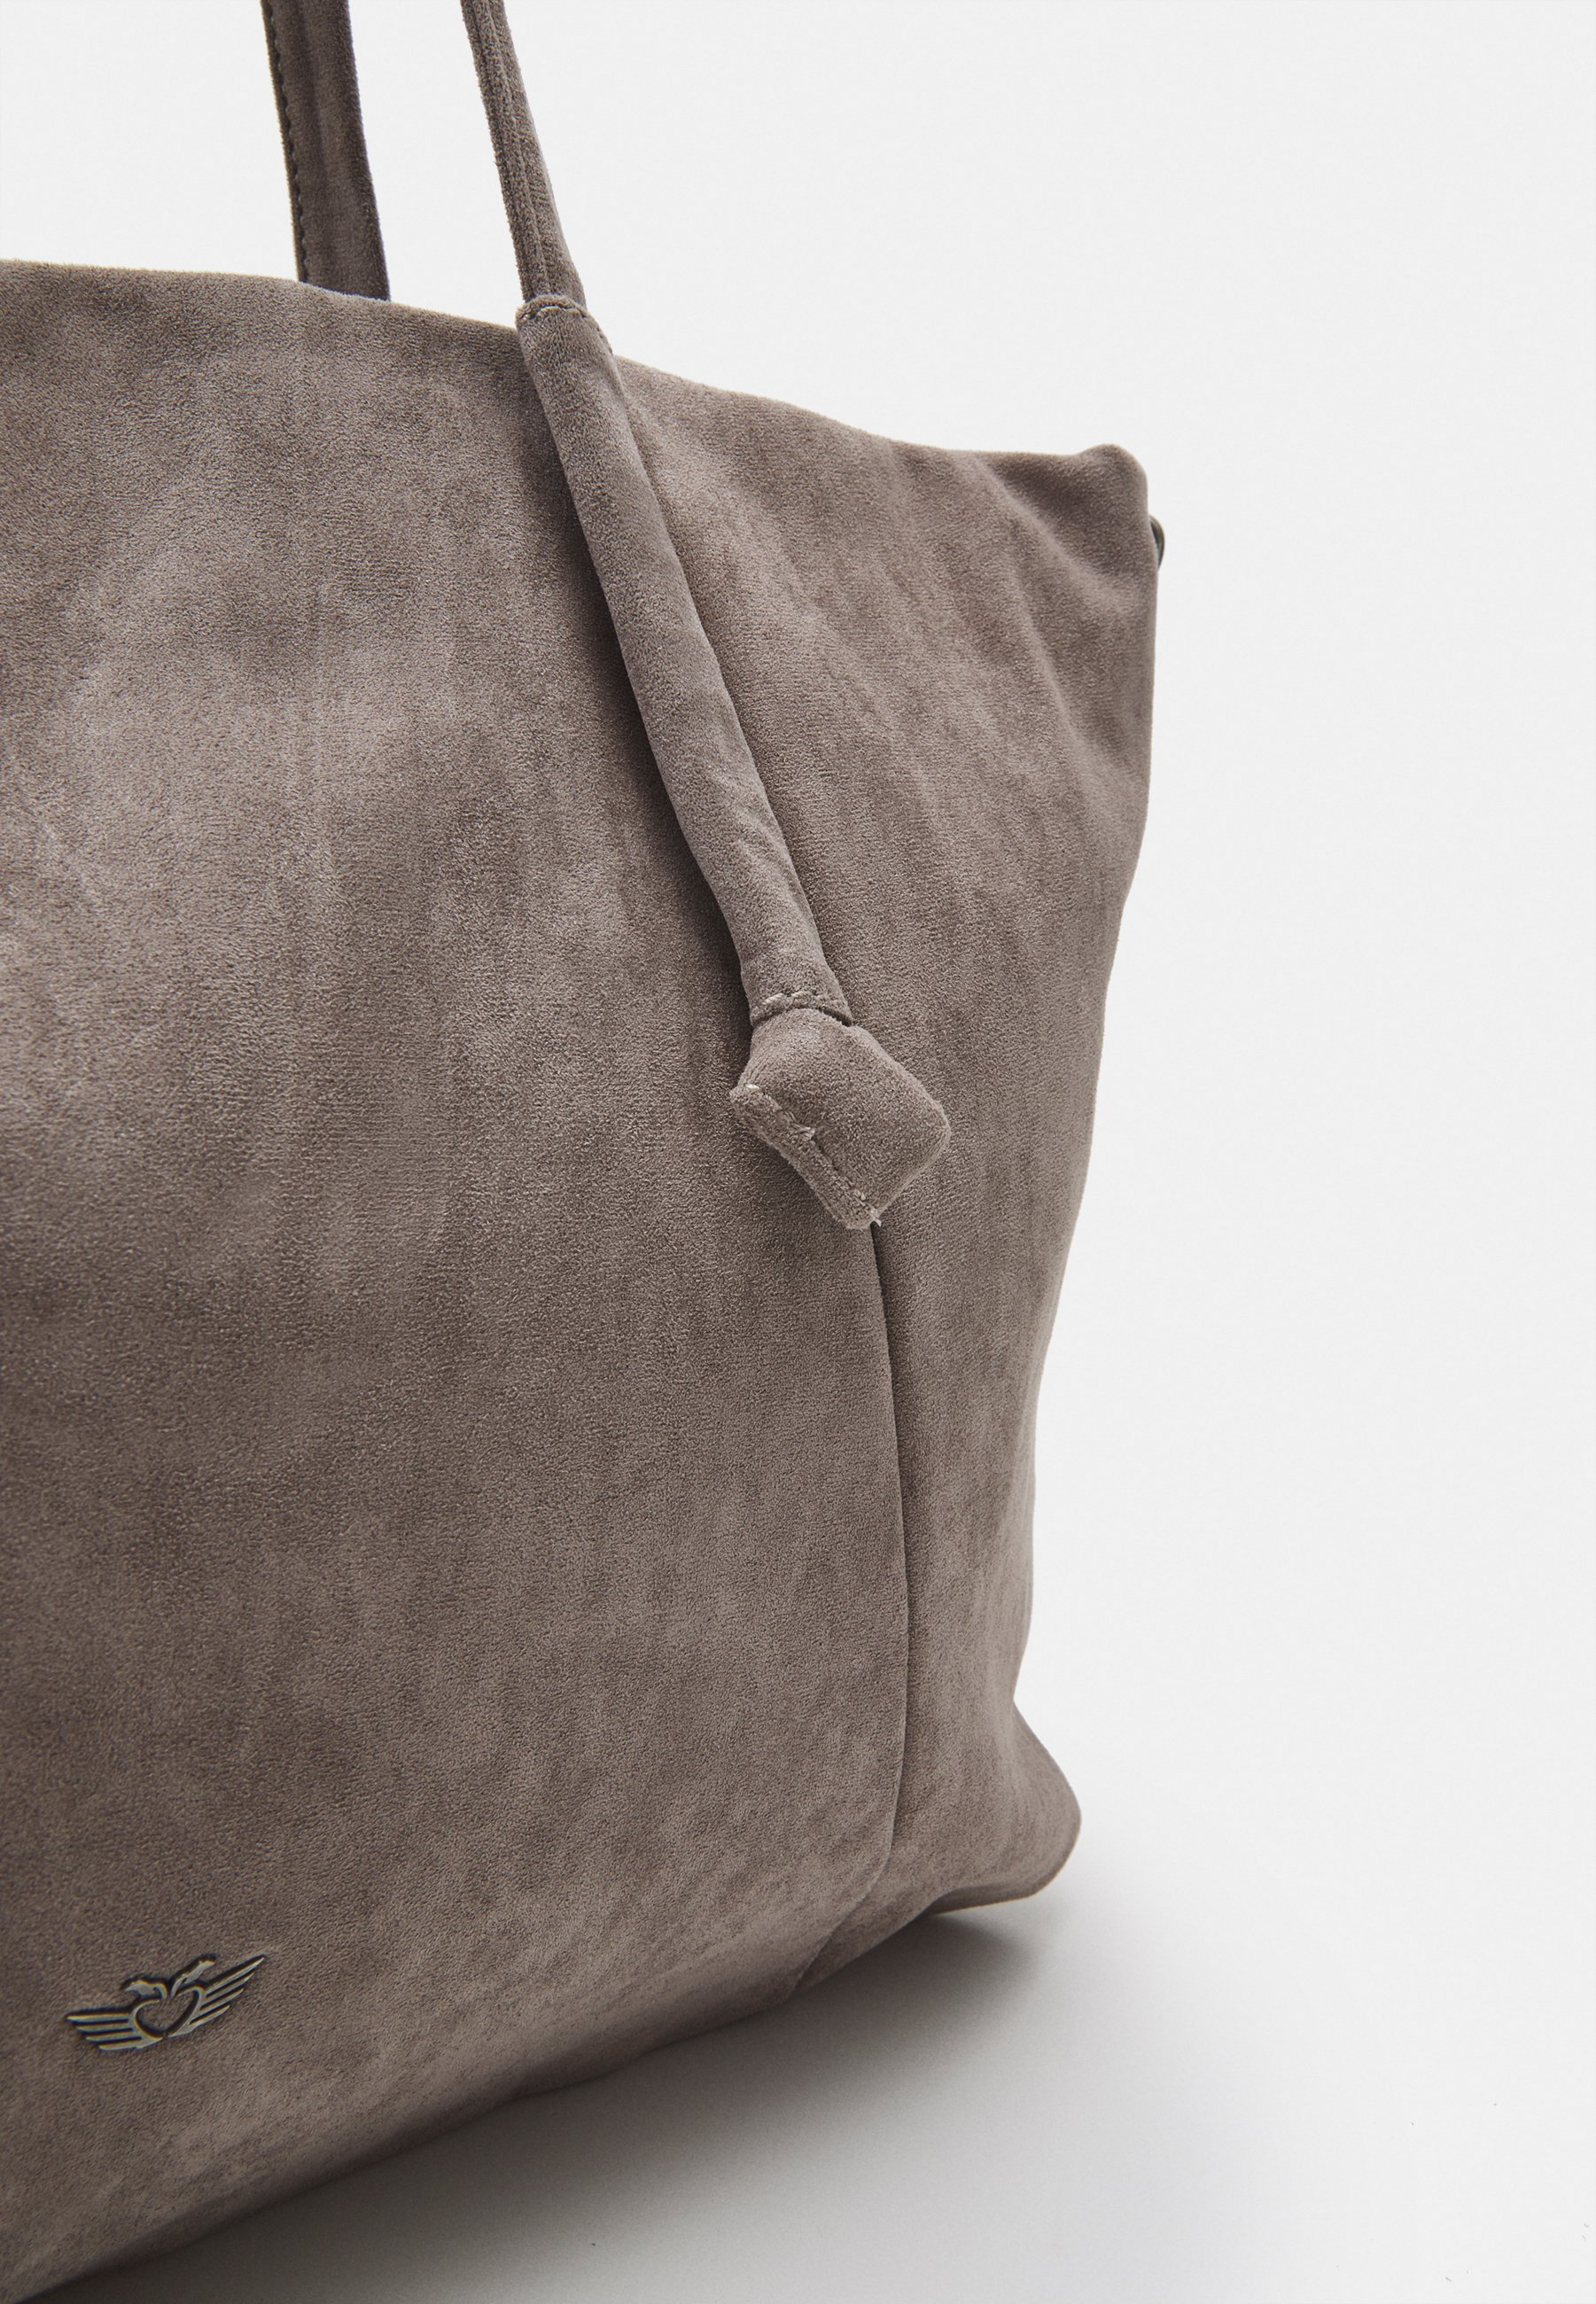 Fritzi aus Preußen LEJA - Shoppingveske - stone/grå SNv4tckar0Acg1j